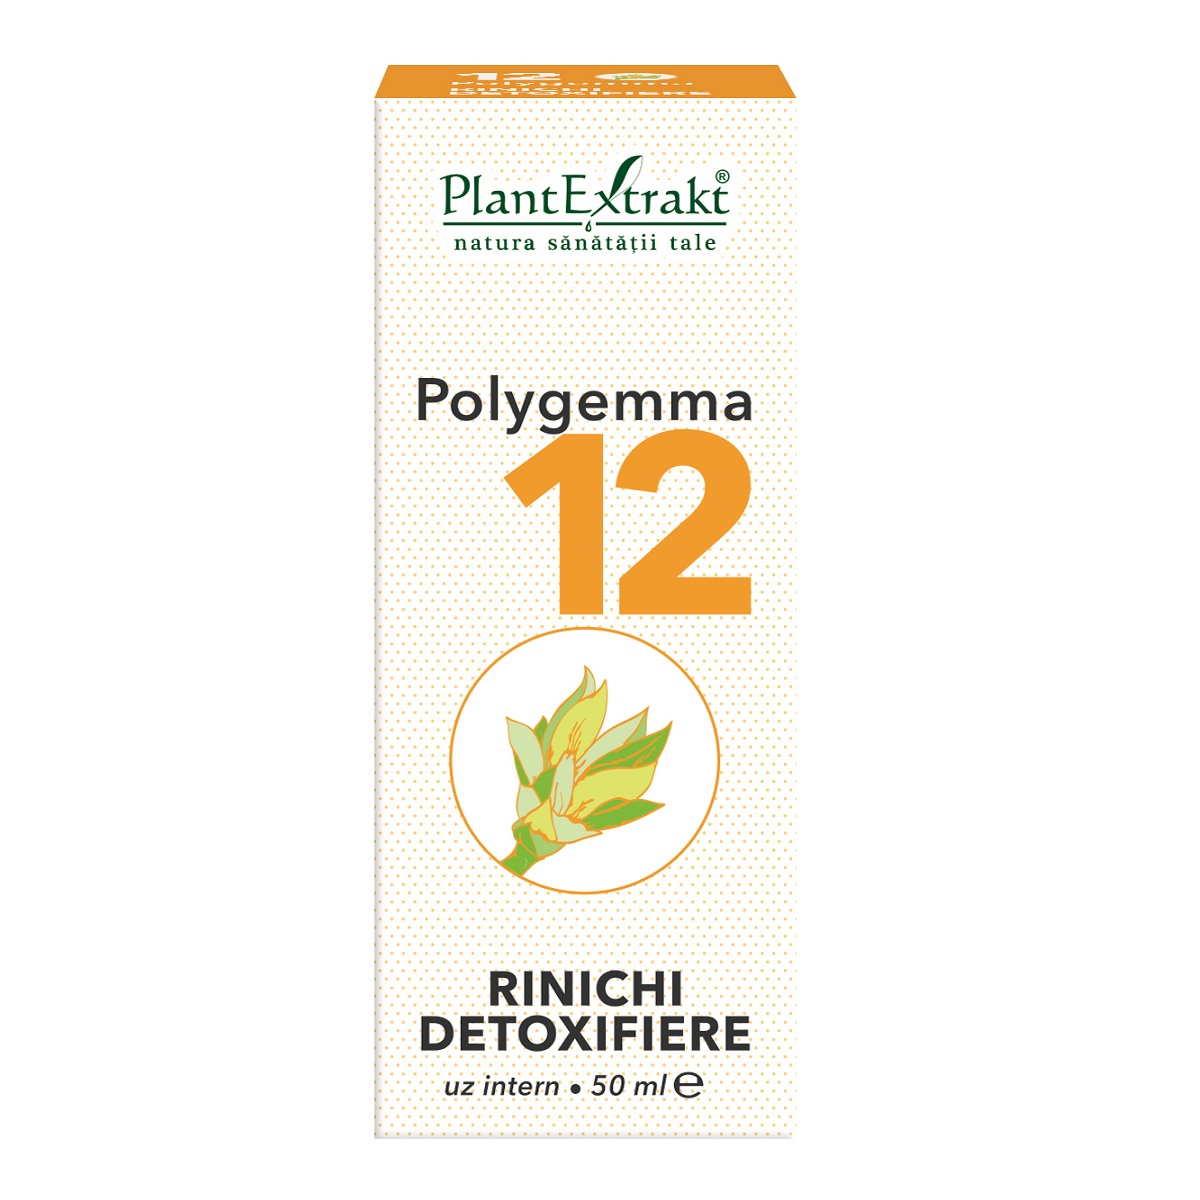 Polygemma 12, 50ml, Plant Extrakt imagine produs 2021